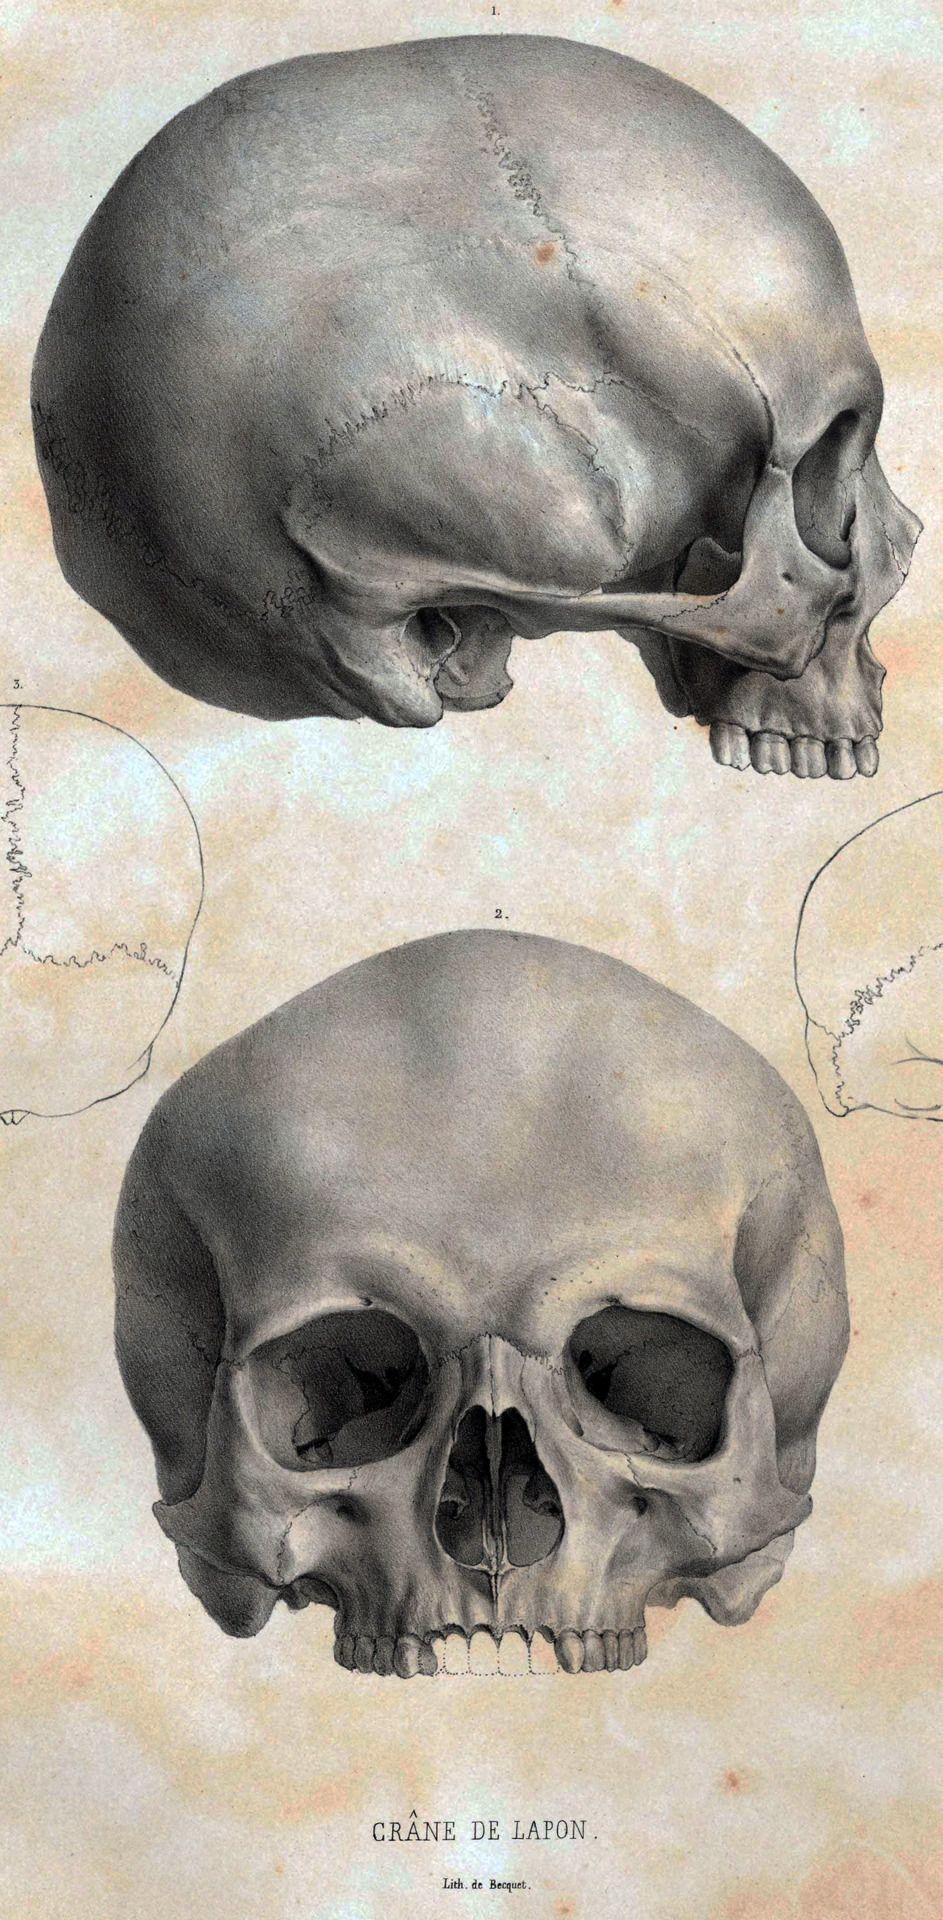 #skull #calavera #craneo